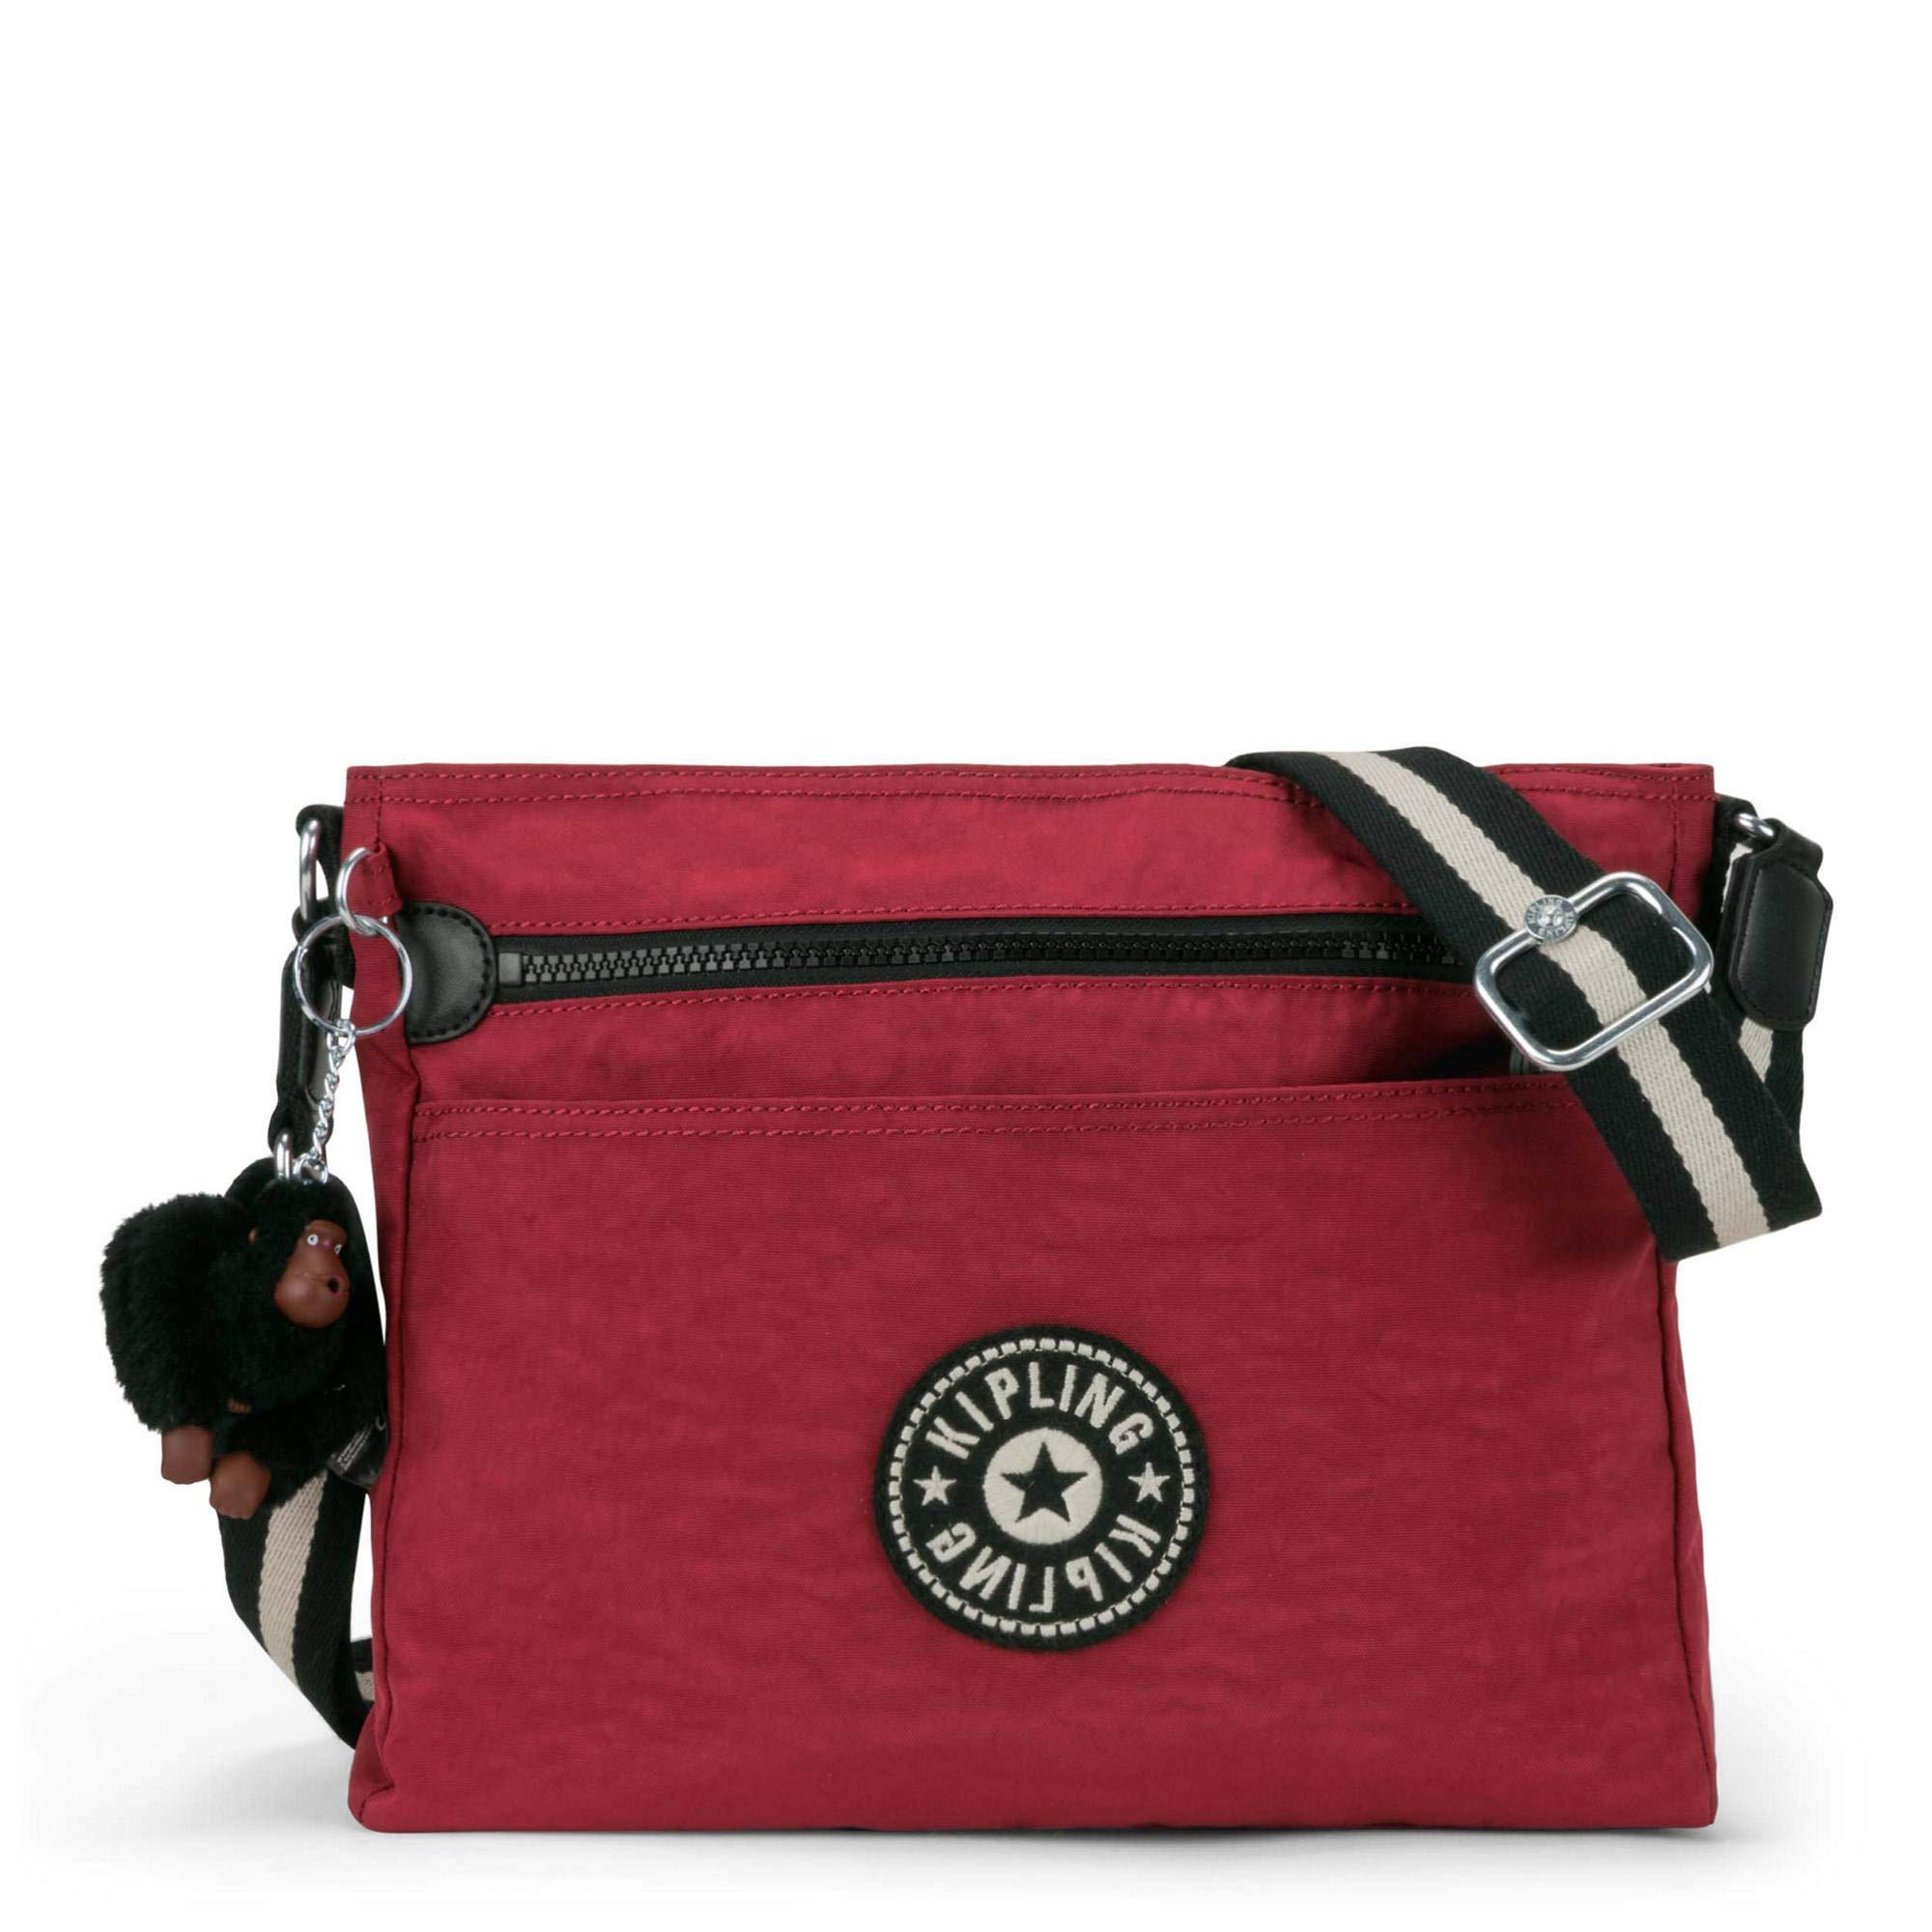 Kipling Shelia Solid Handbag, Brick Red by Kipling